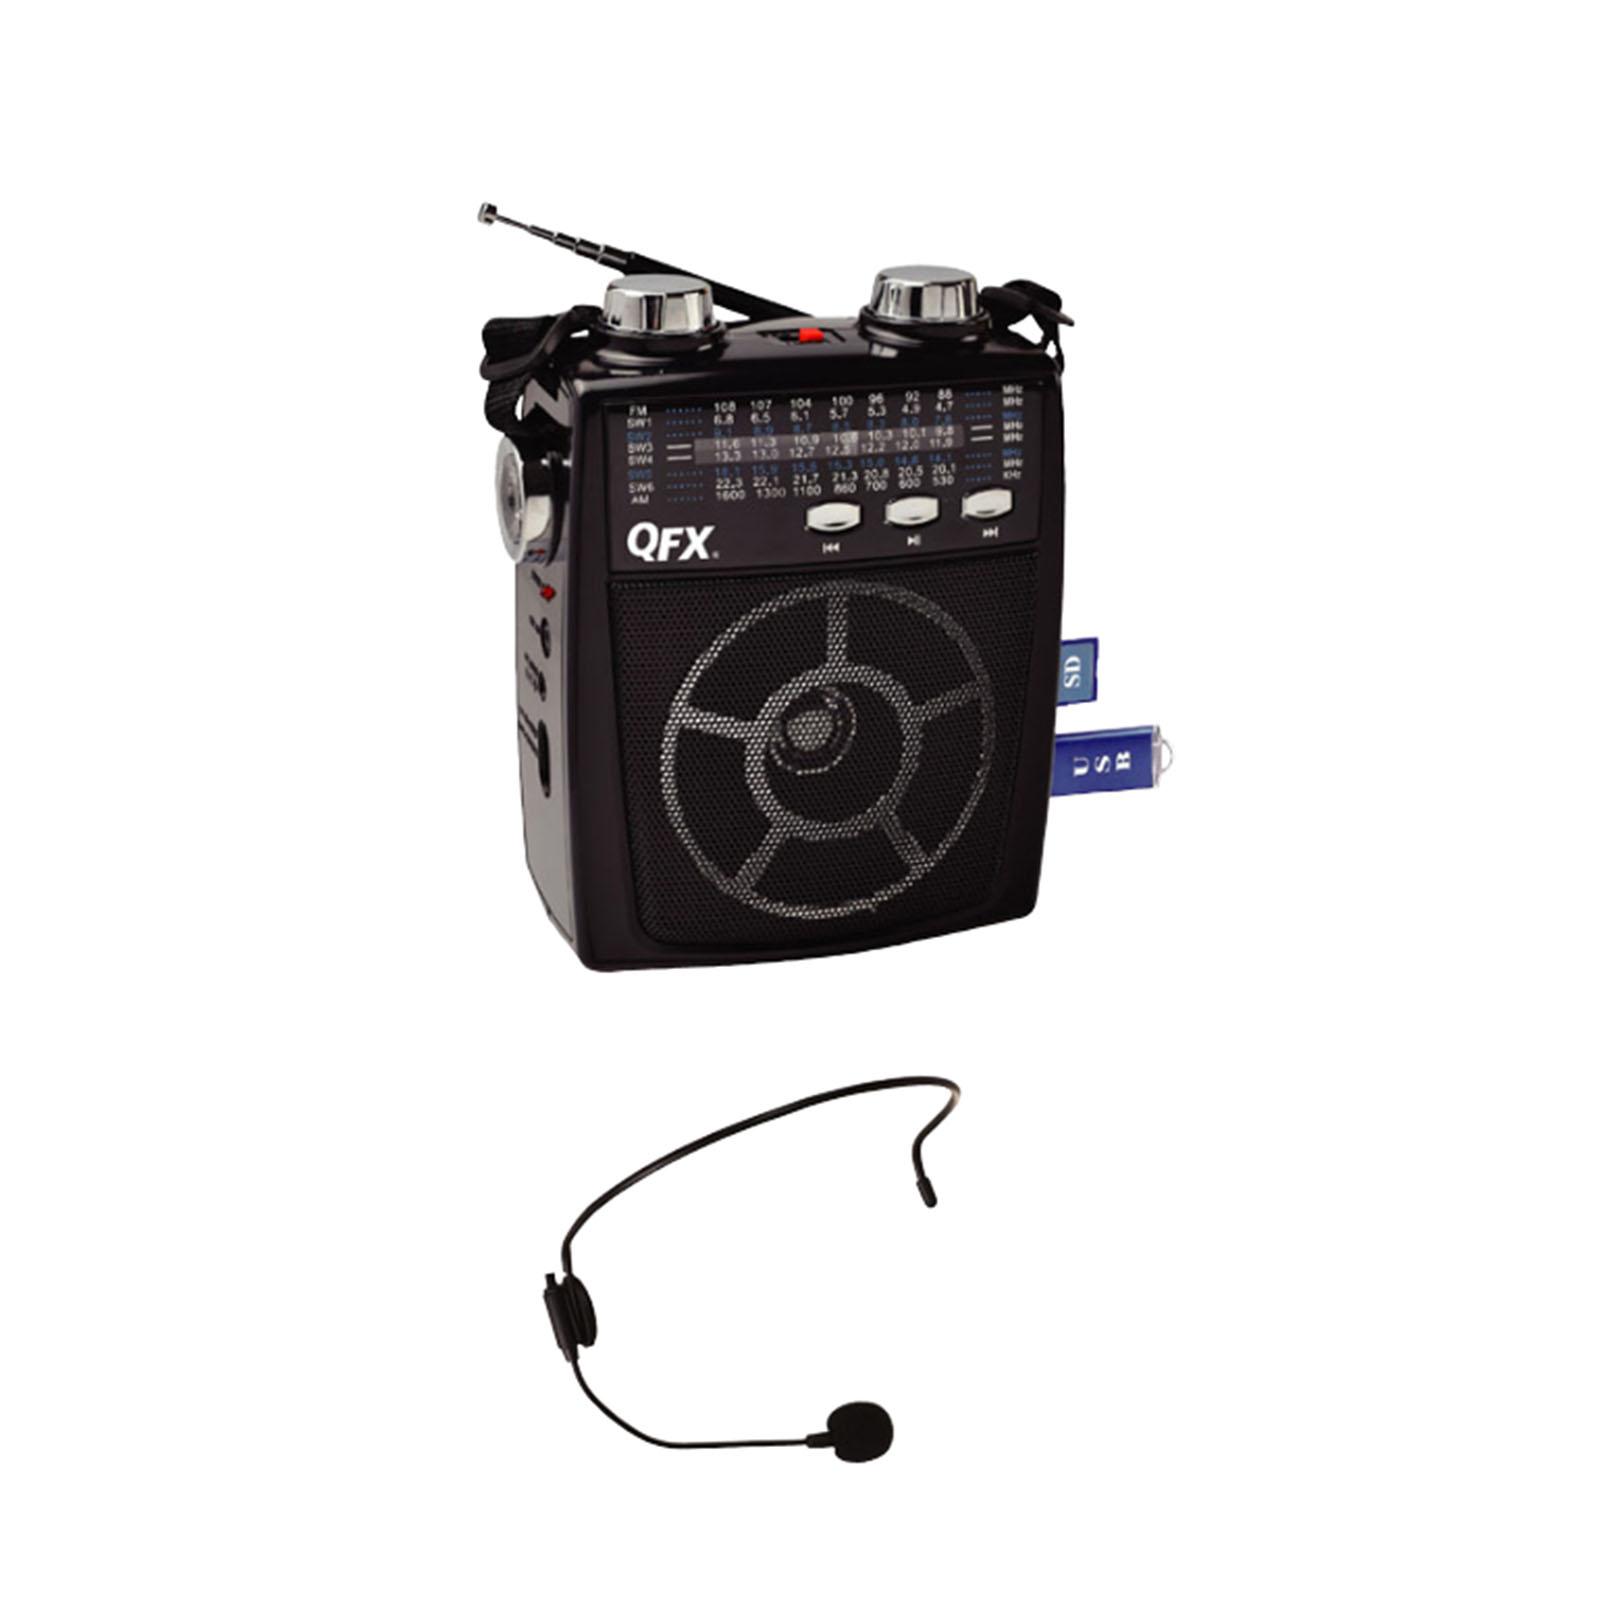 Quantum FX 97091893M QFX Portable Pa system USB/SD and AM/FM/SW1-6 Radio 8 Band Radio- Black PartNumber: 05741484000P KsnValue: 8818728 MfgPartNumber: 97091893M